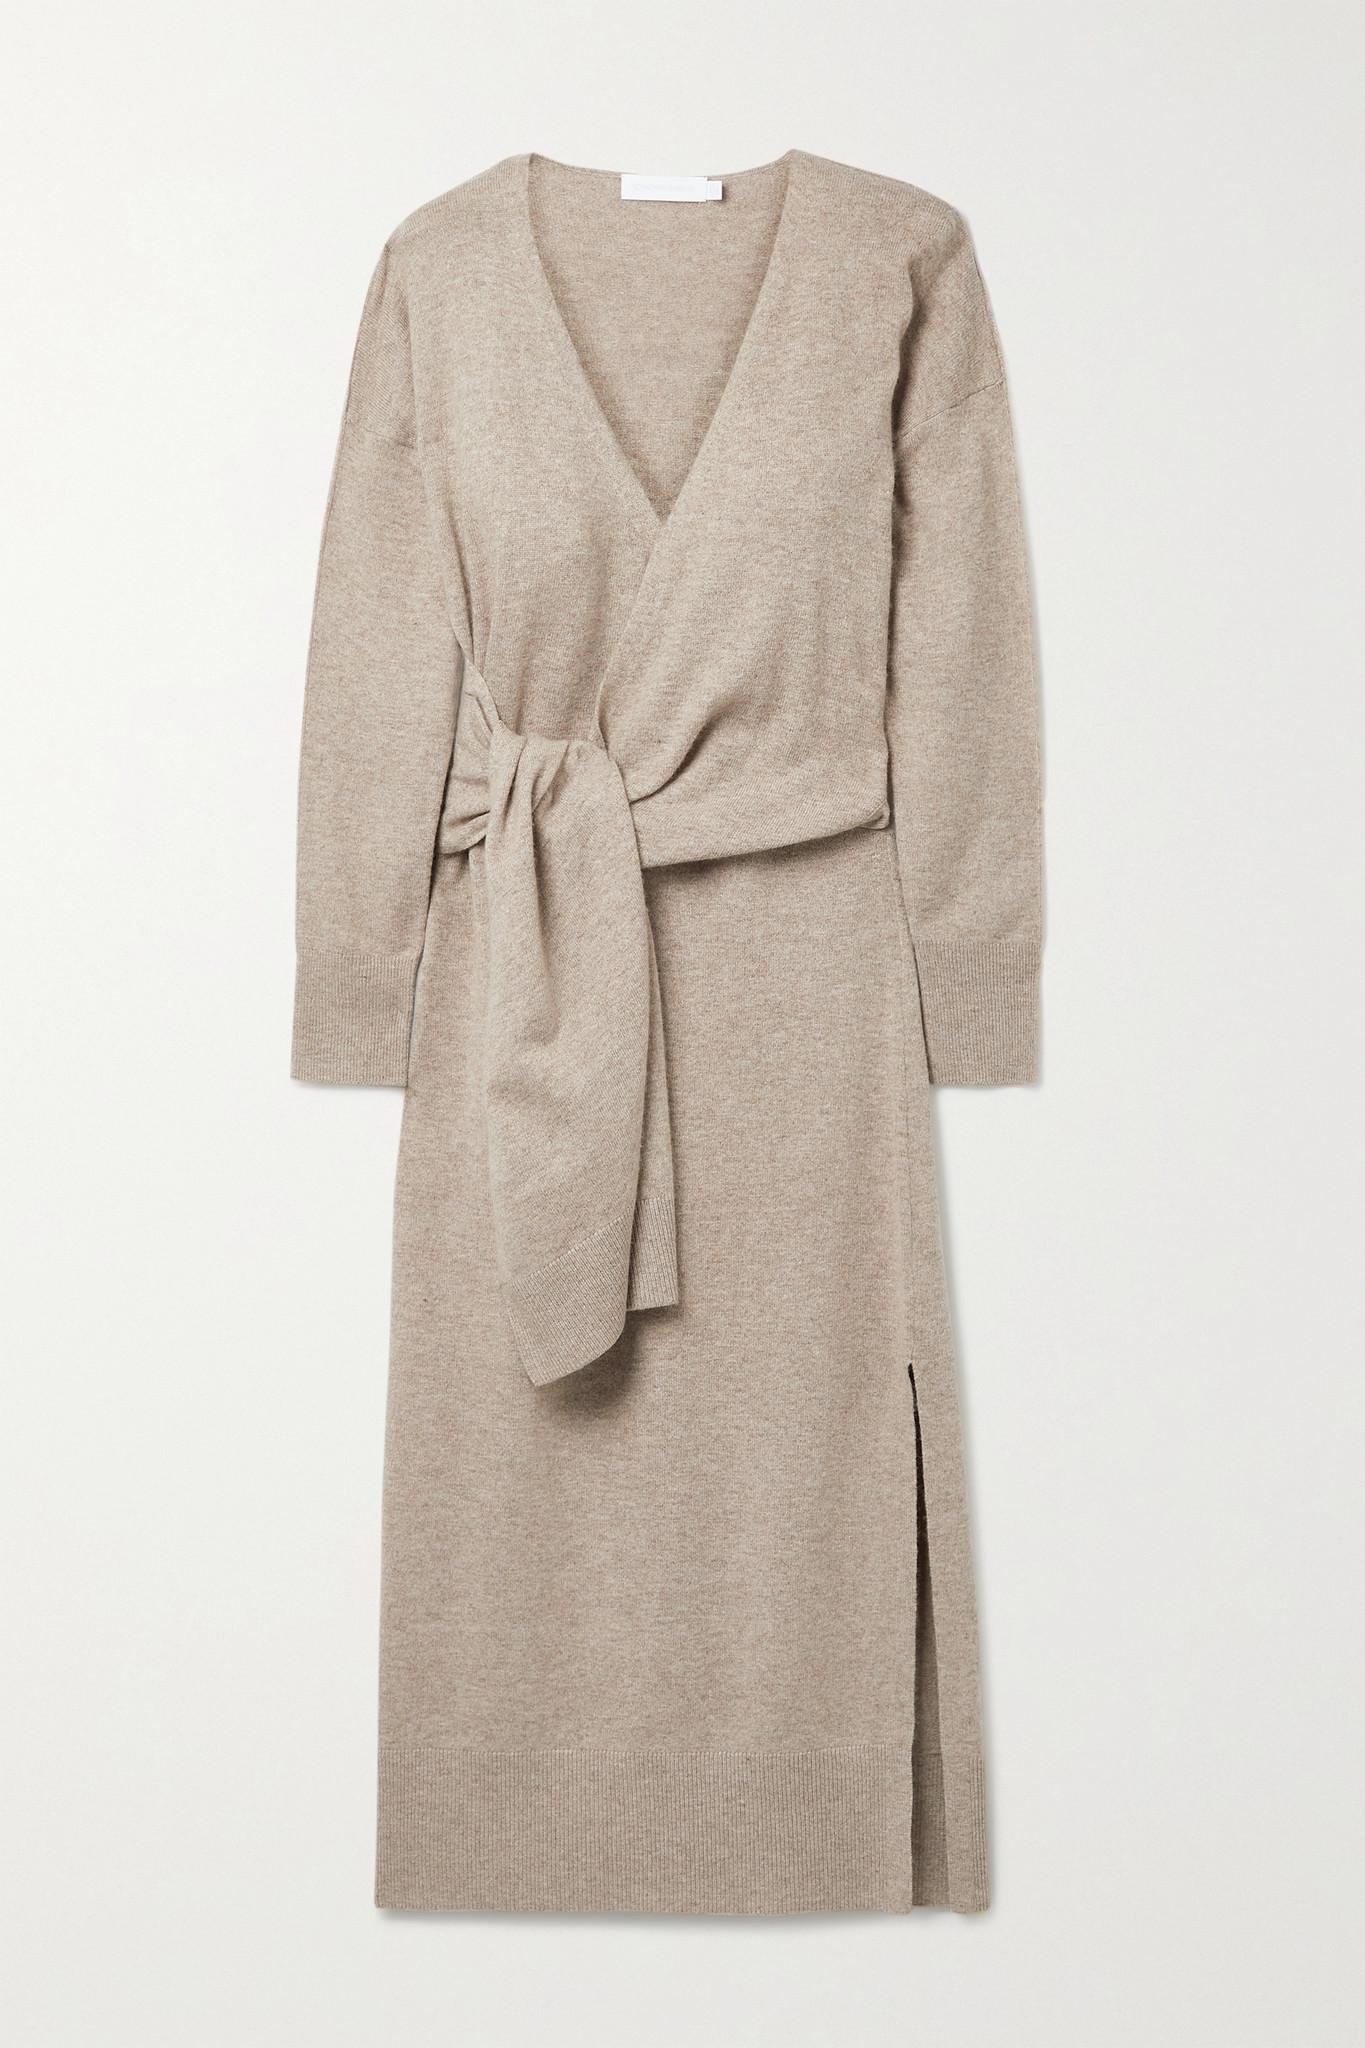 JONATHAN SIMKHAI - Skyla 针织中长裹身连衣裙 - 棕色 - medium